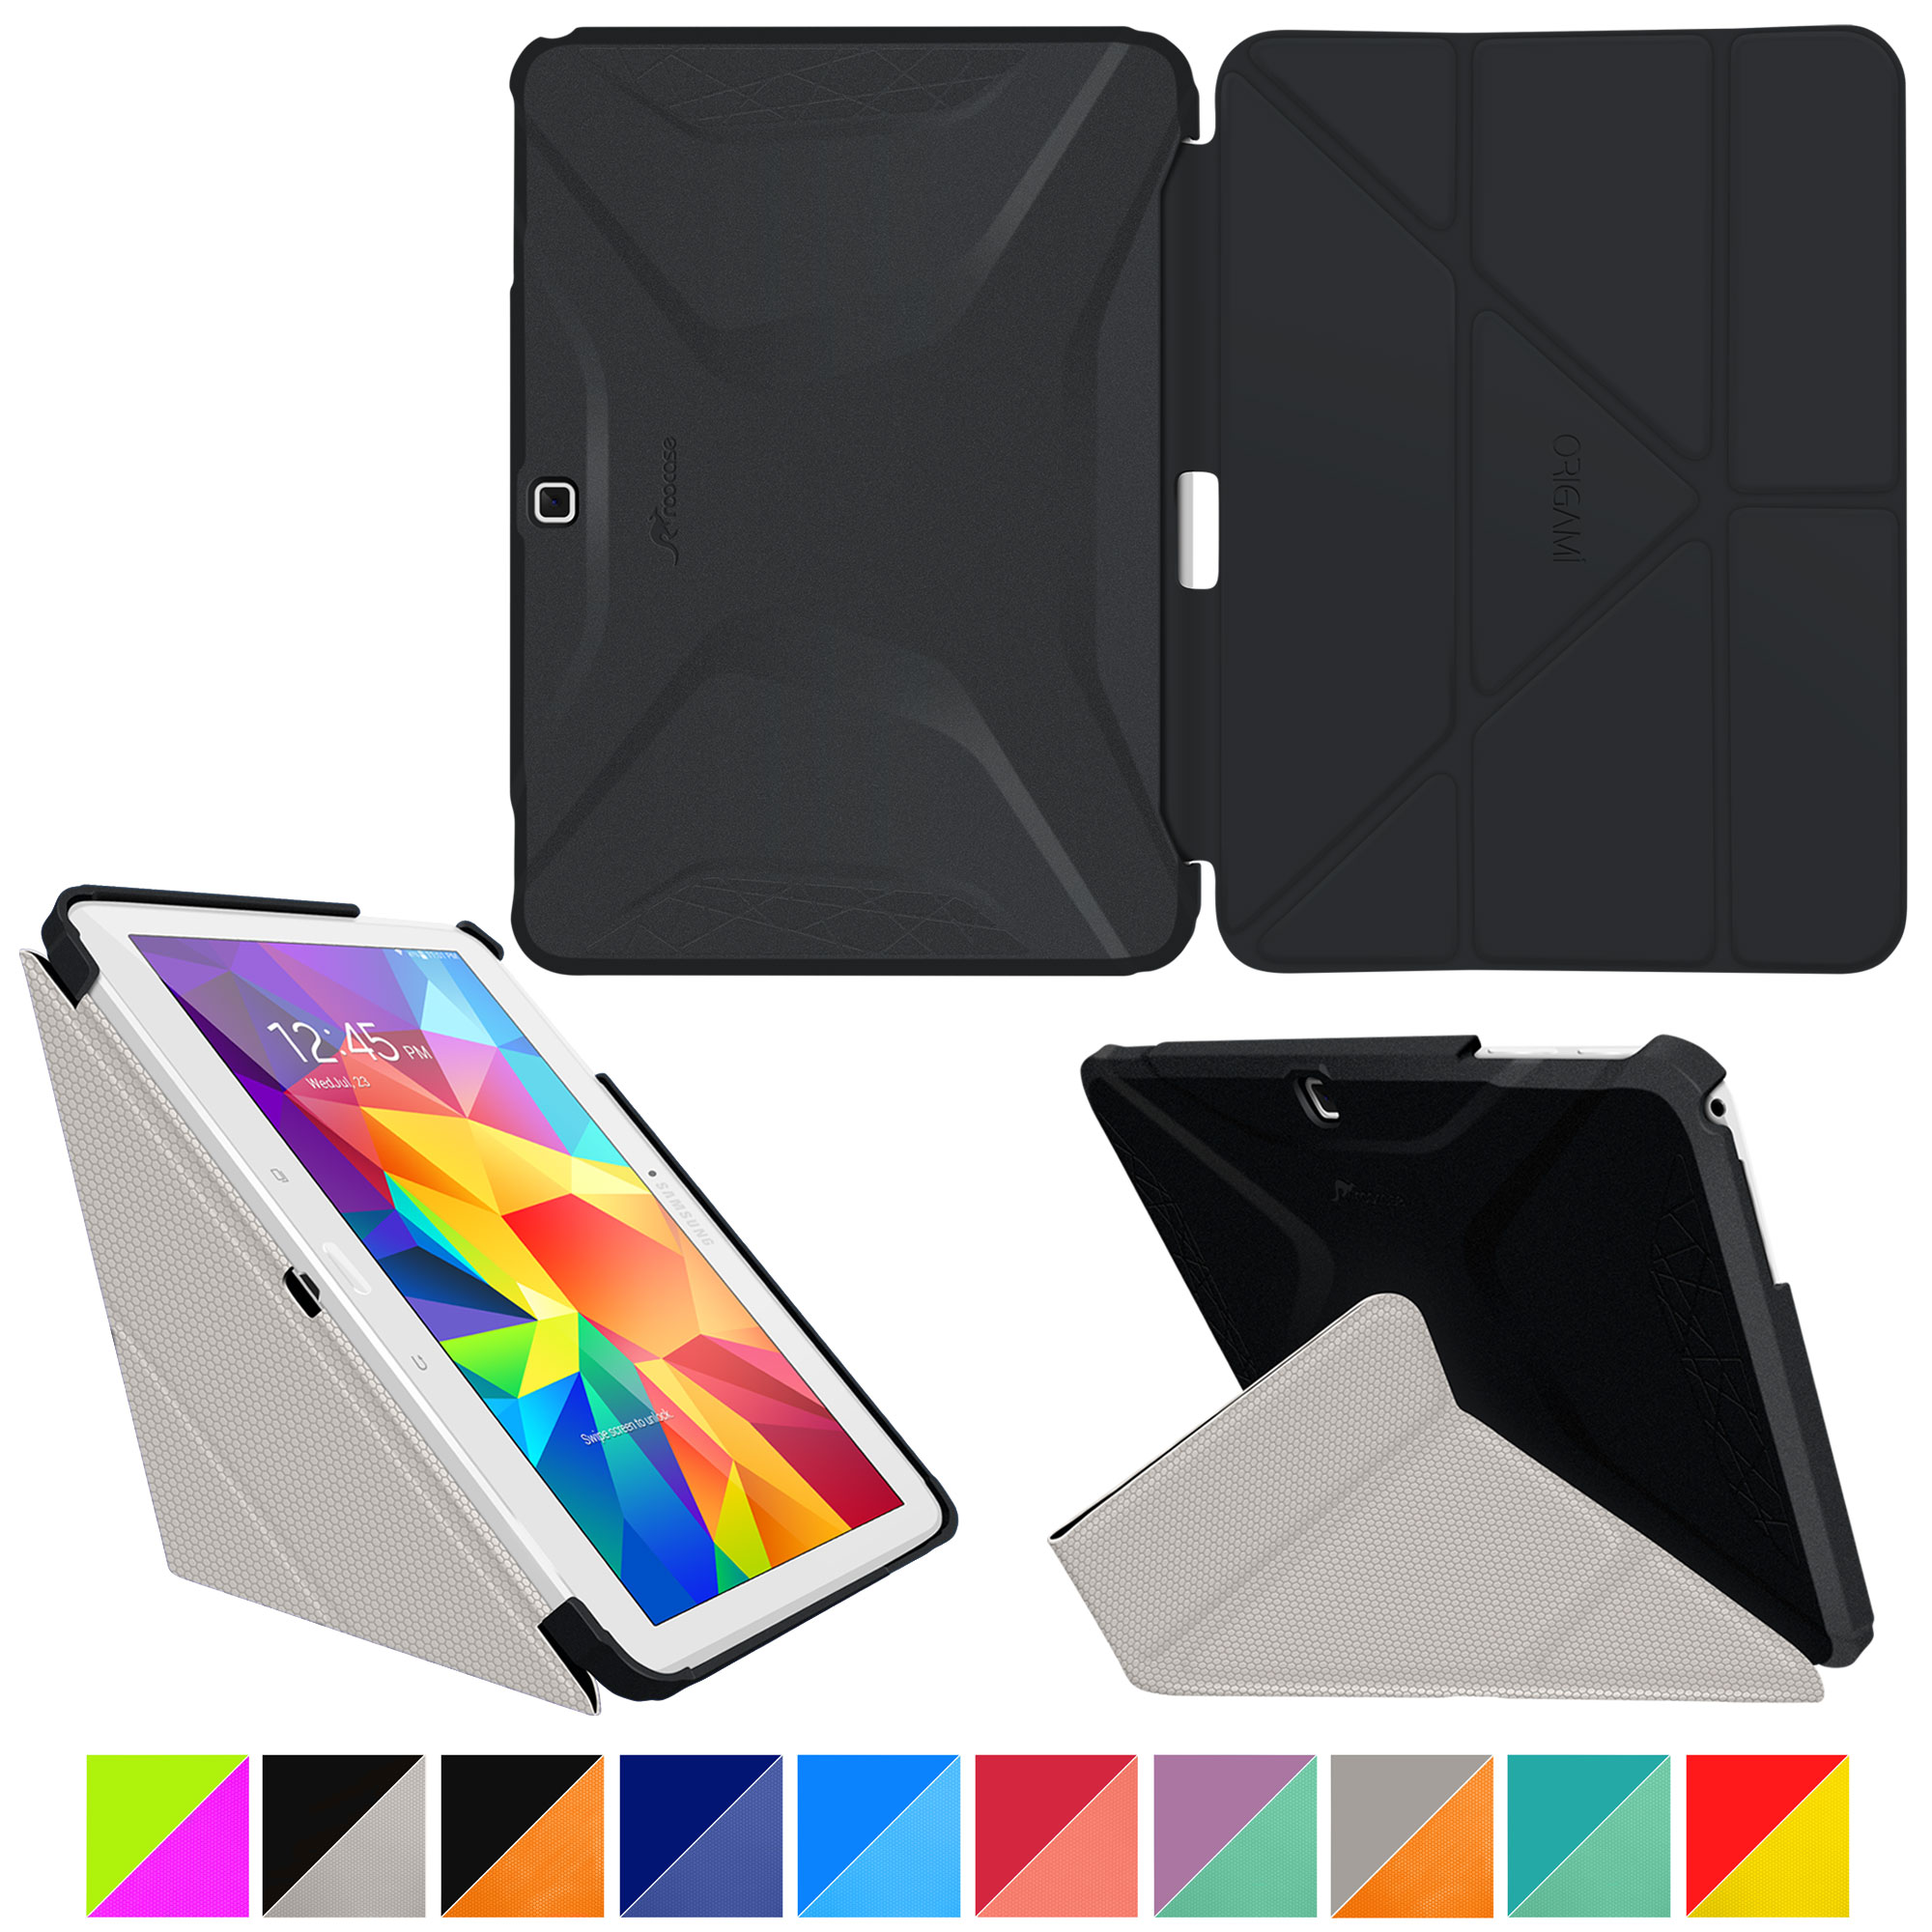 Galaxy Tab 4 10.1 Case, Samsung Galaxy Tab 4 10.1 Case, Origami Slim Fit Shell Lightweight Folio Leather PU Smart Cover Wake / Sleep Stand, Black/Gray